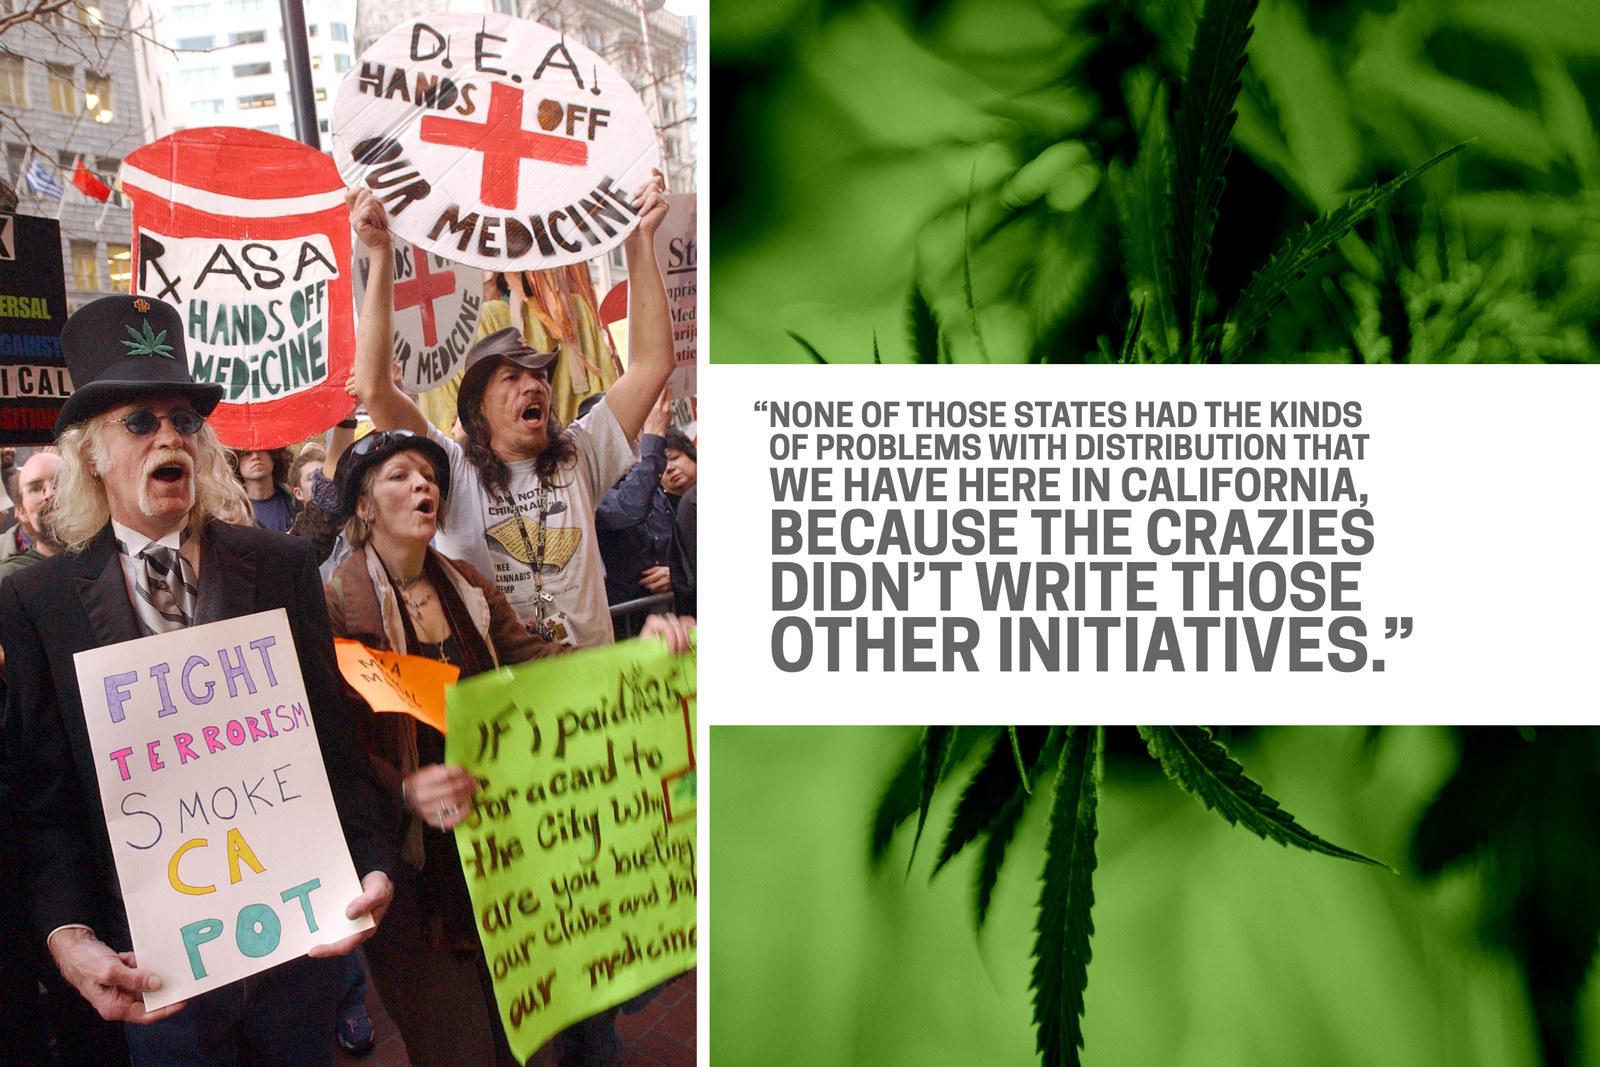 Why Hasn't California Legalized Marijuana Yet?